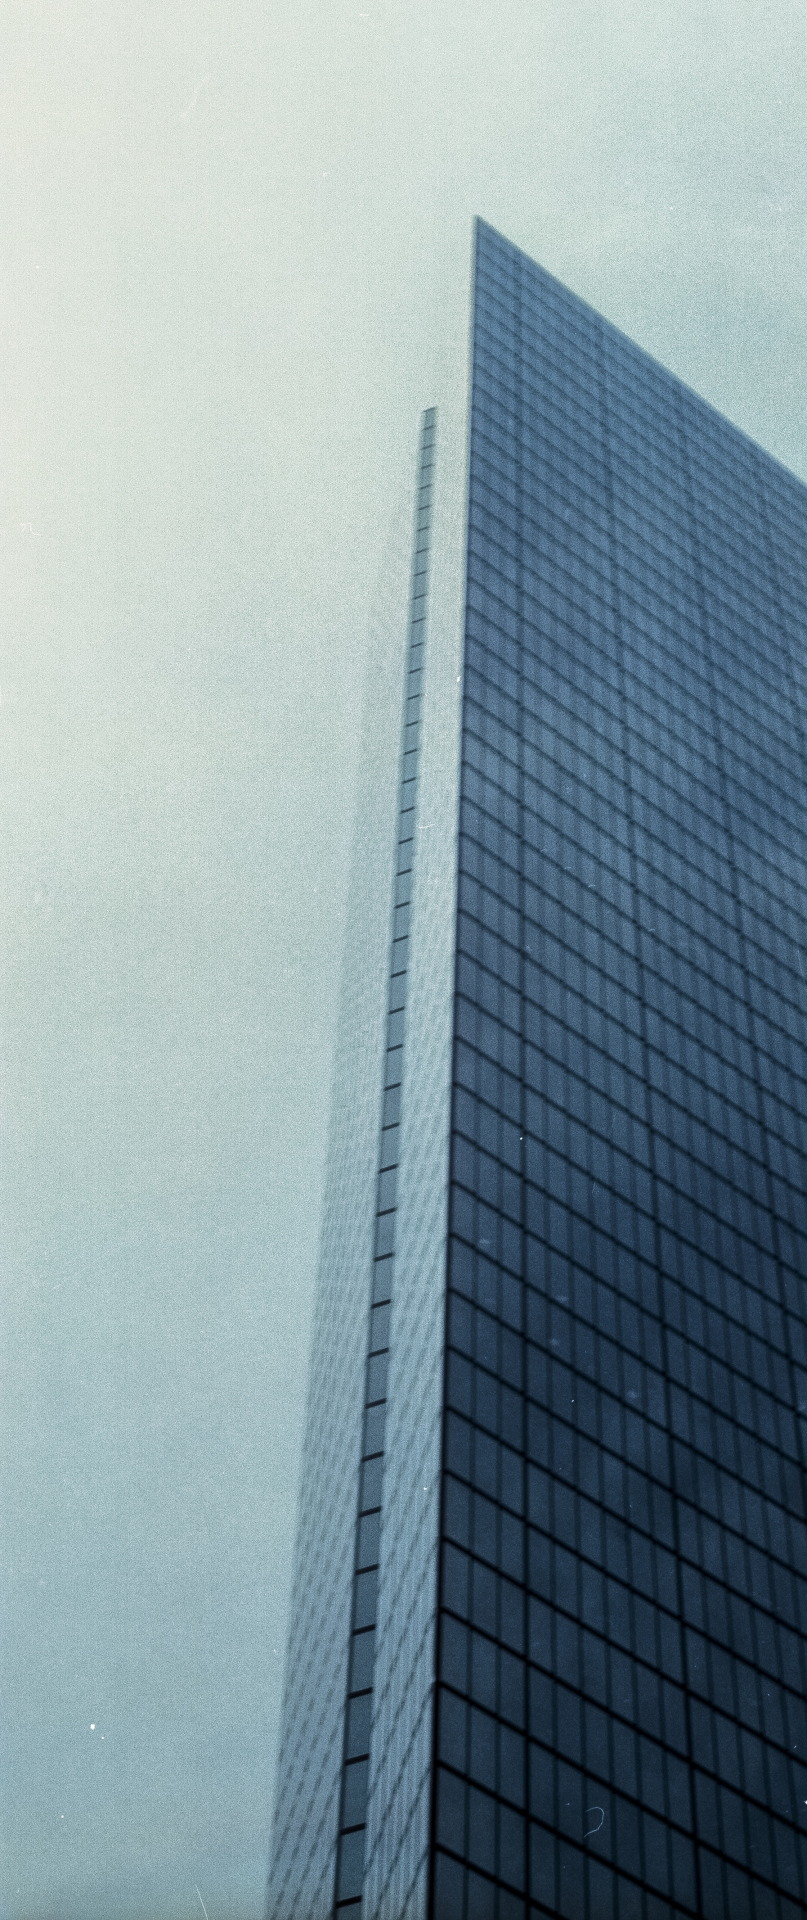 Shot on 35mm film